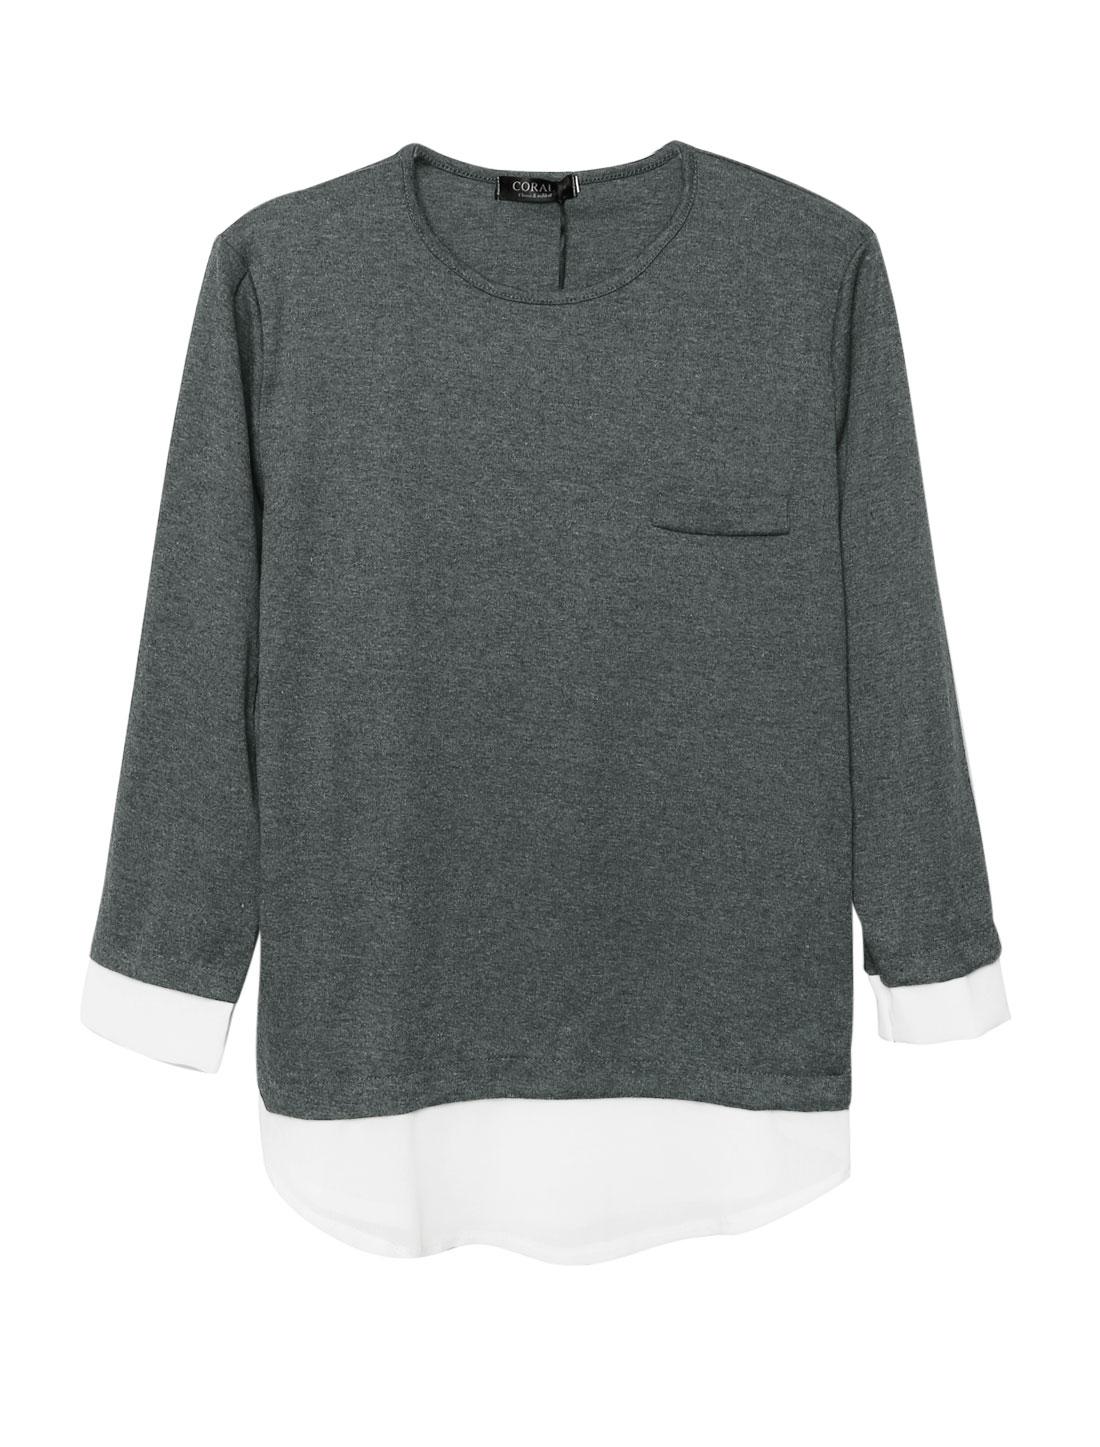 Ladies Pullover Panel Design Loose Dark Gray Tunic Shirt M